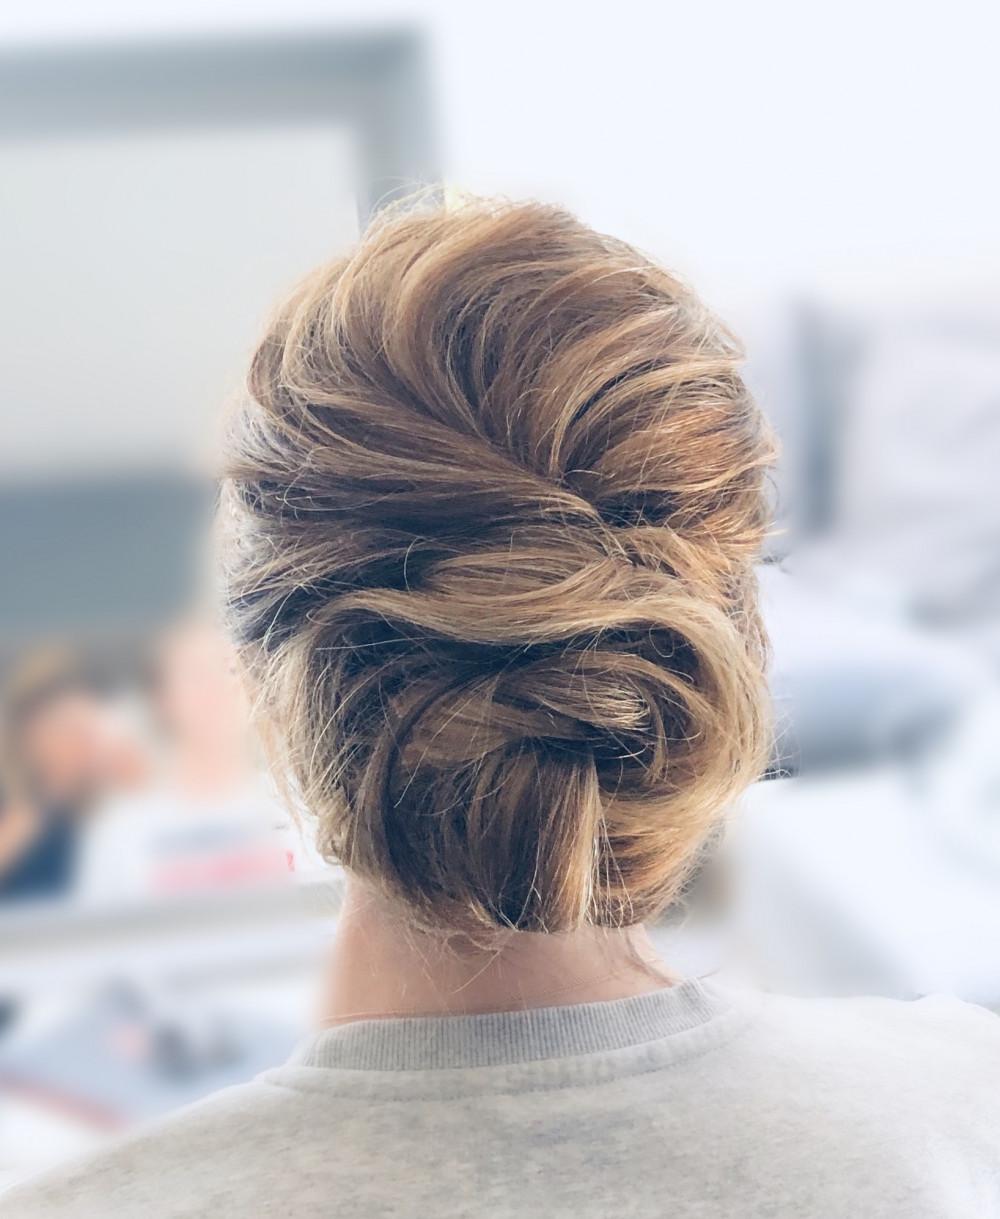 Hair by CJ (CJ's Directors Package) - Make Me Bridal Artist: CJ Beauty & Co. #glamorous #boho #romantichairup #bridalhair #softupdo #softhairup #romance #bohobride #messyupdo #bridalupdo #messyhair